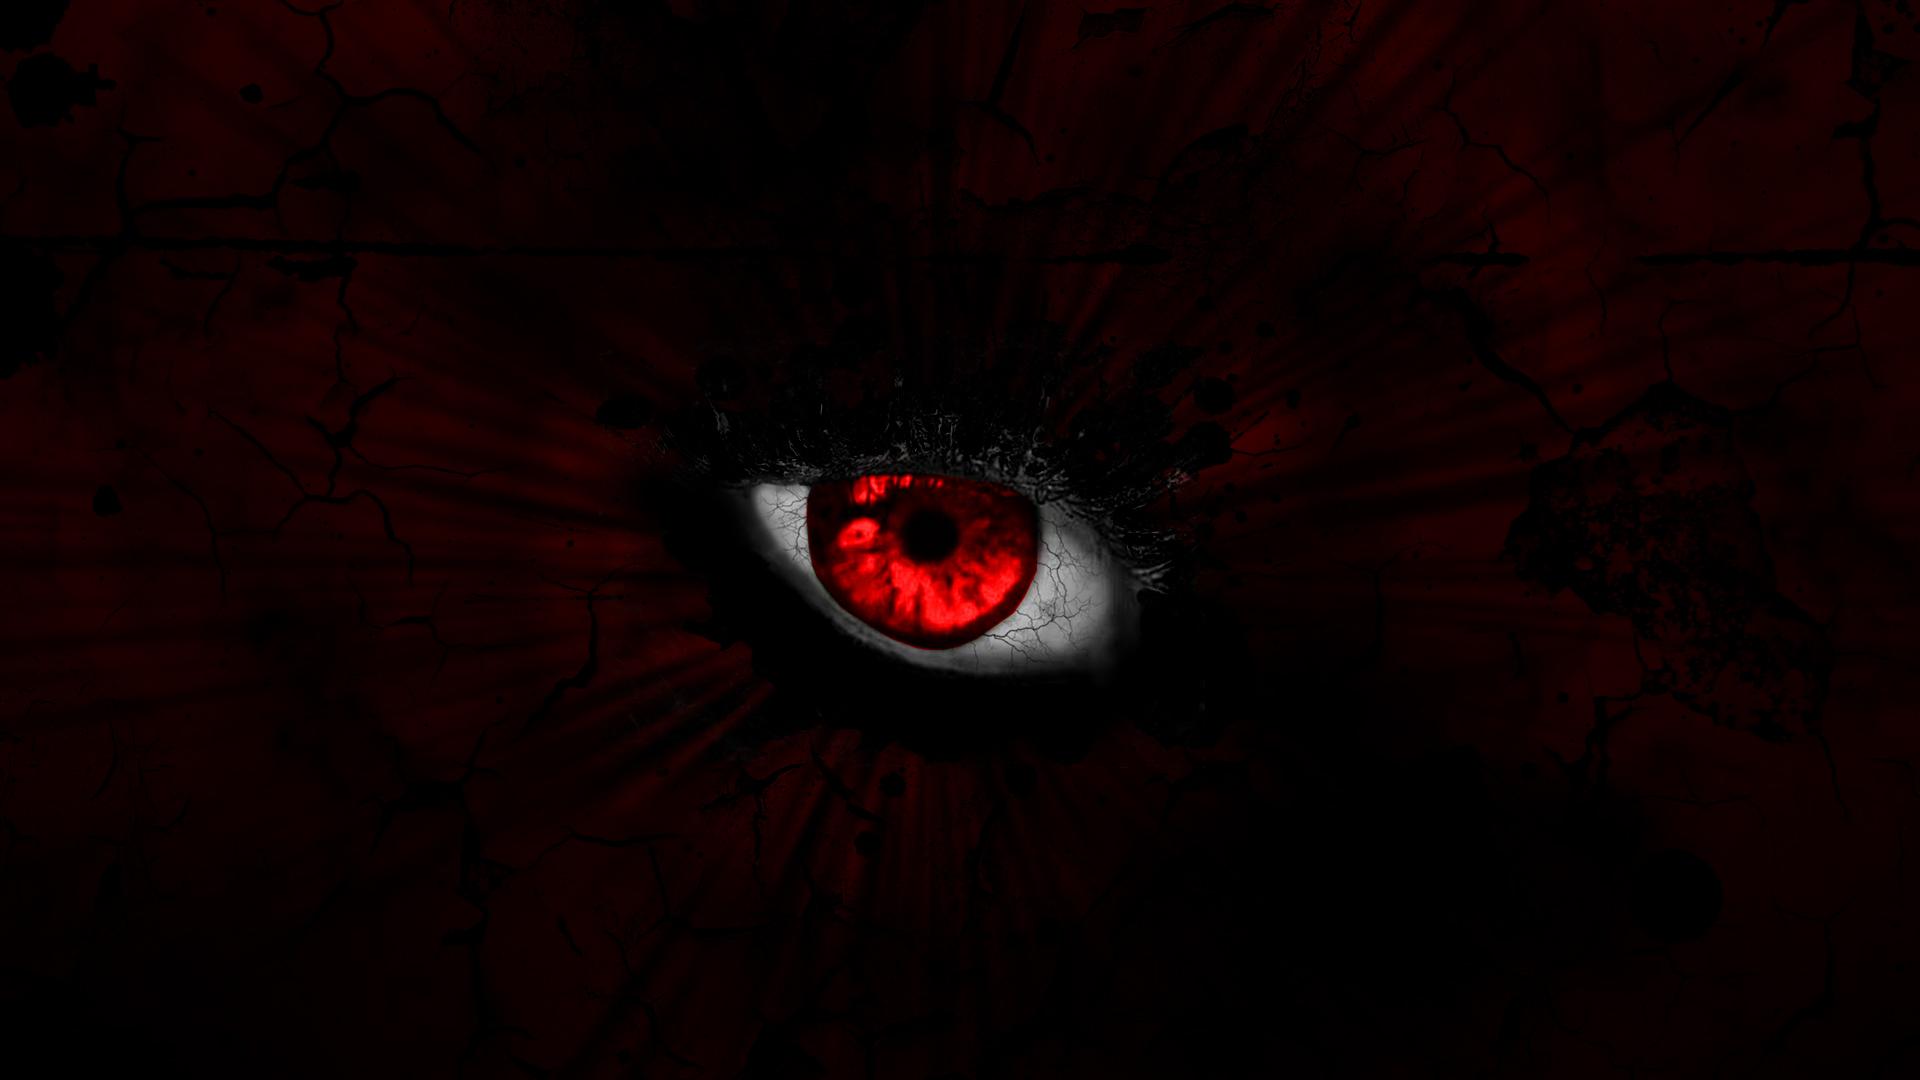 Red Devil Eyes Wallpaper Best 289 2757 Wallpaper High Resolution 1920x1080